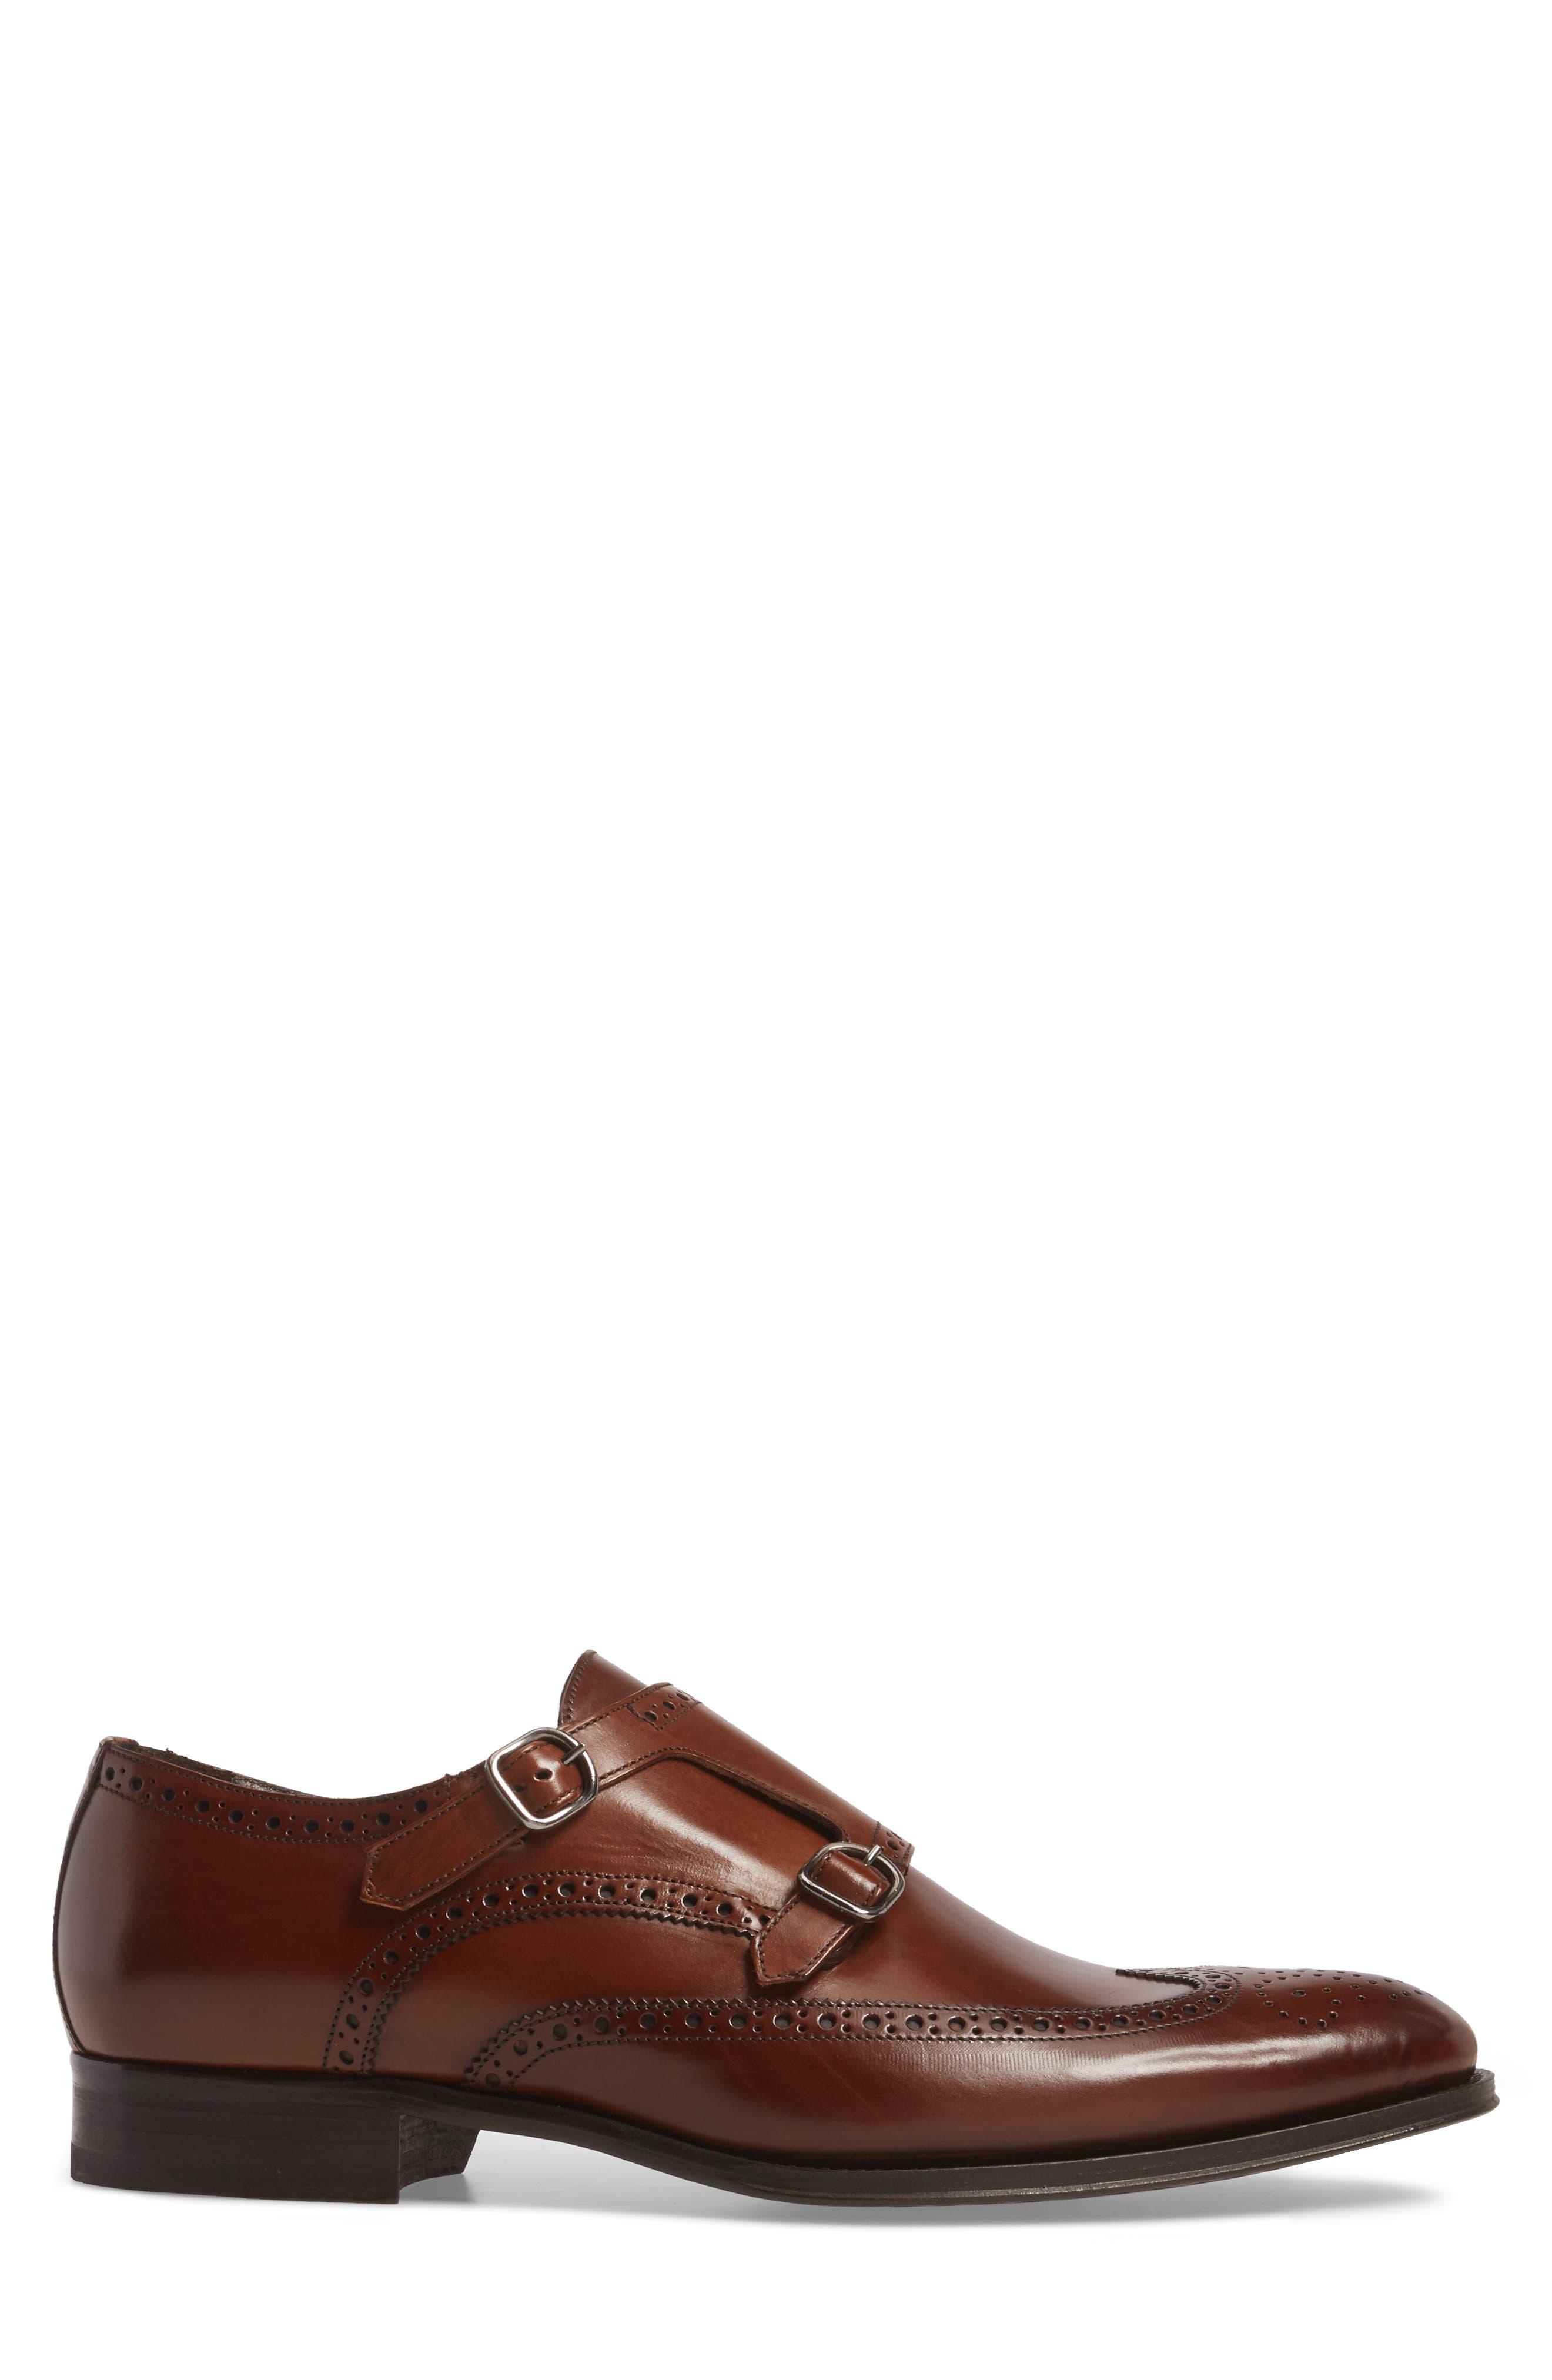 Pike Double Monk Strap Shoe,                             Alternate thumbnail 3, color,                             237